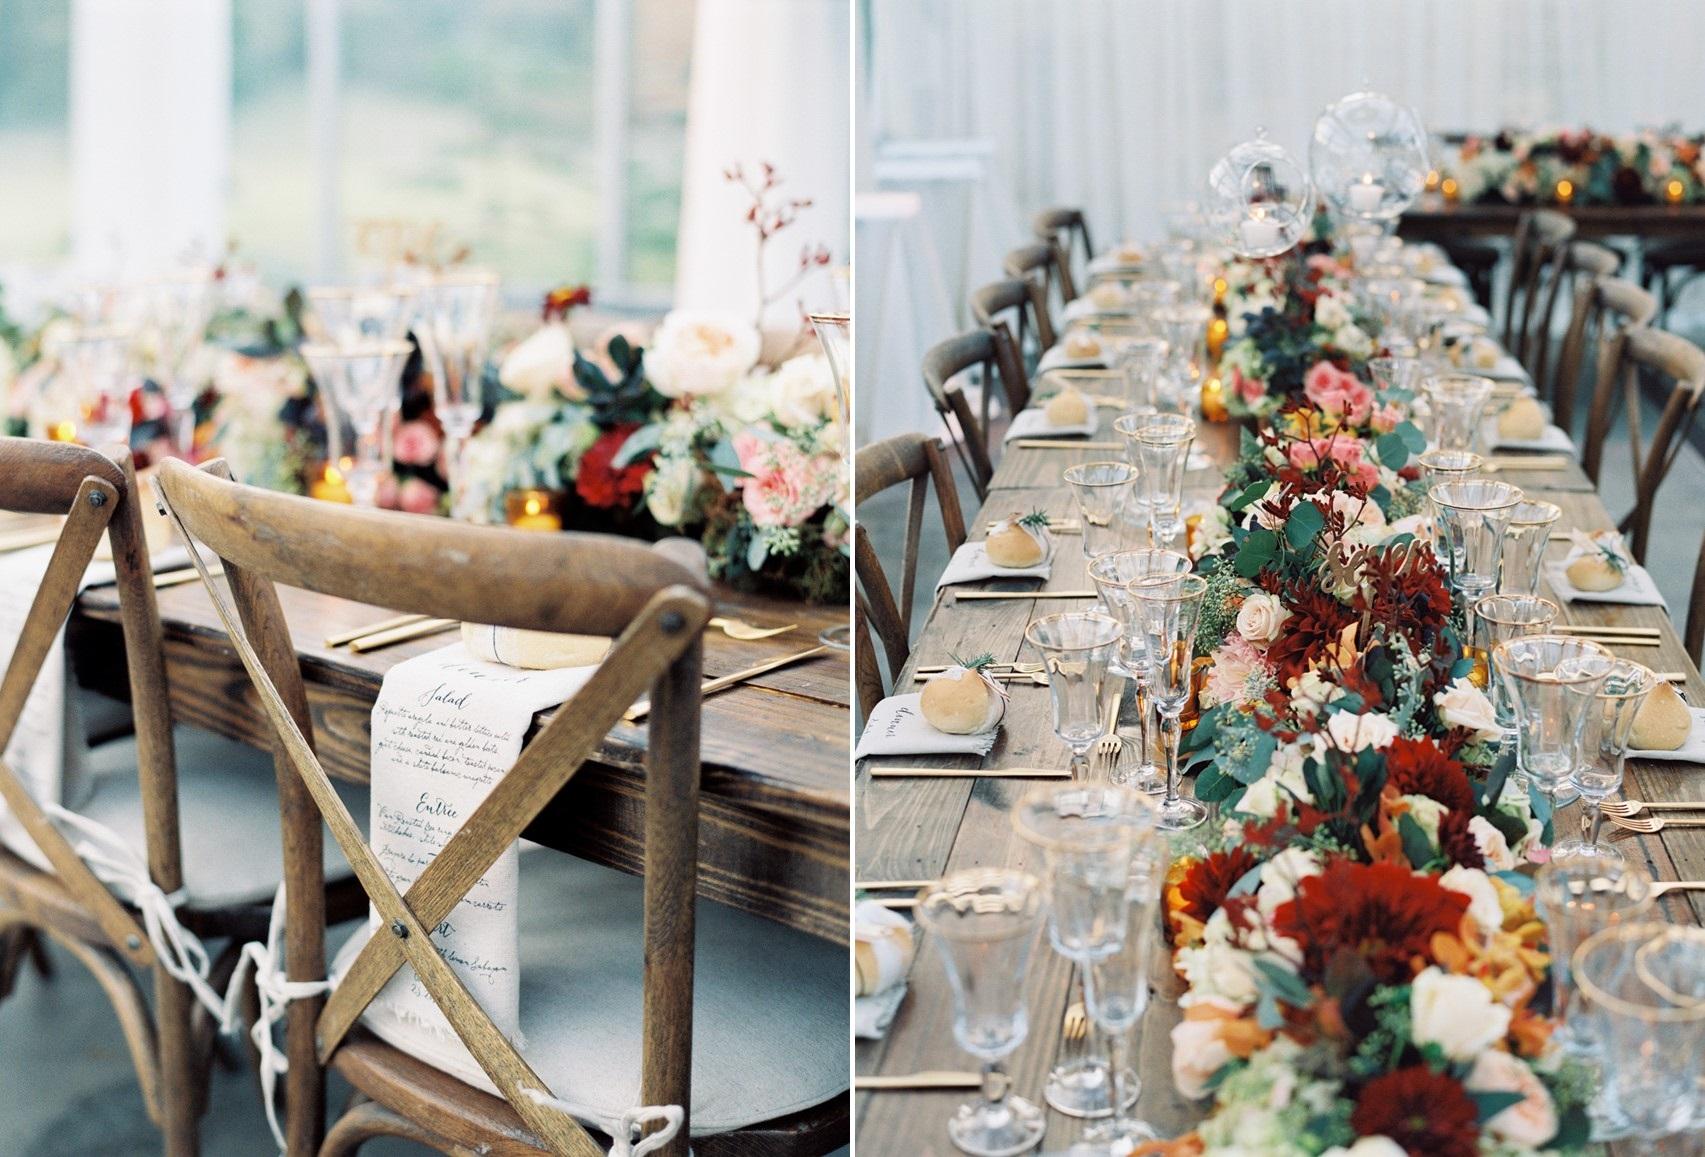 Autumn Wedding Tablescape - An Elegant & Intimate Autumn Wedding